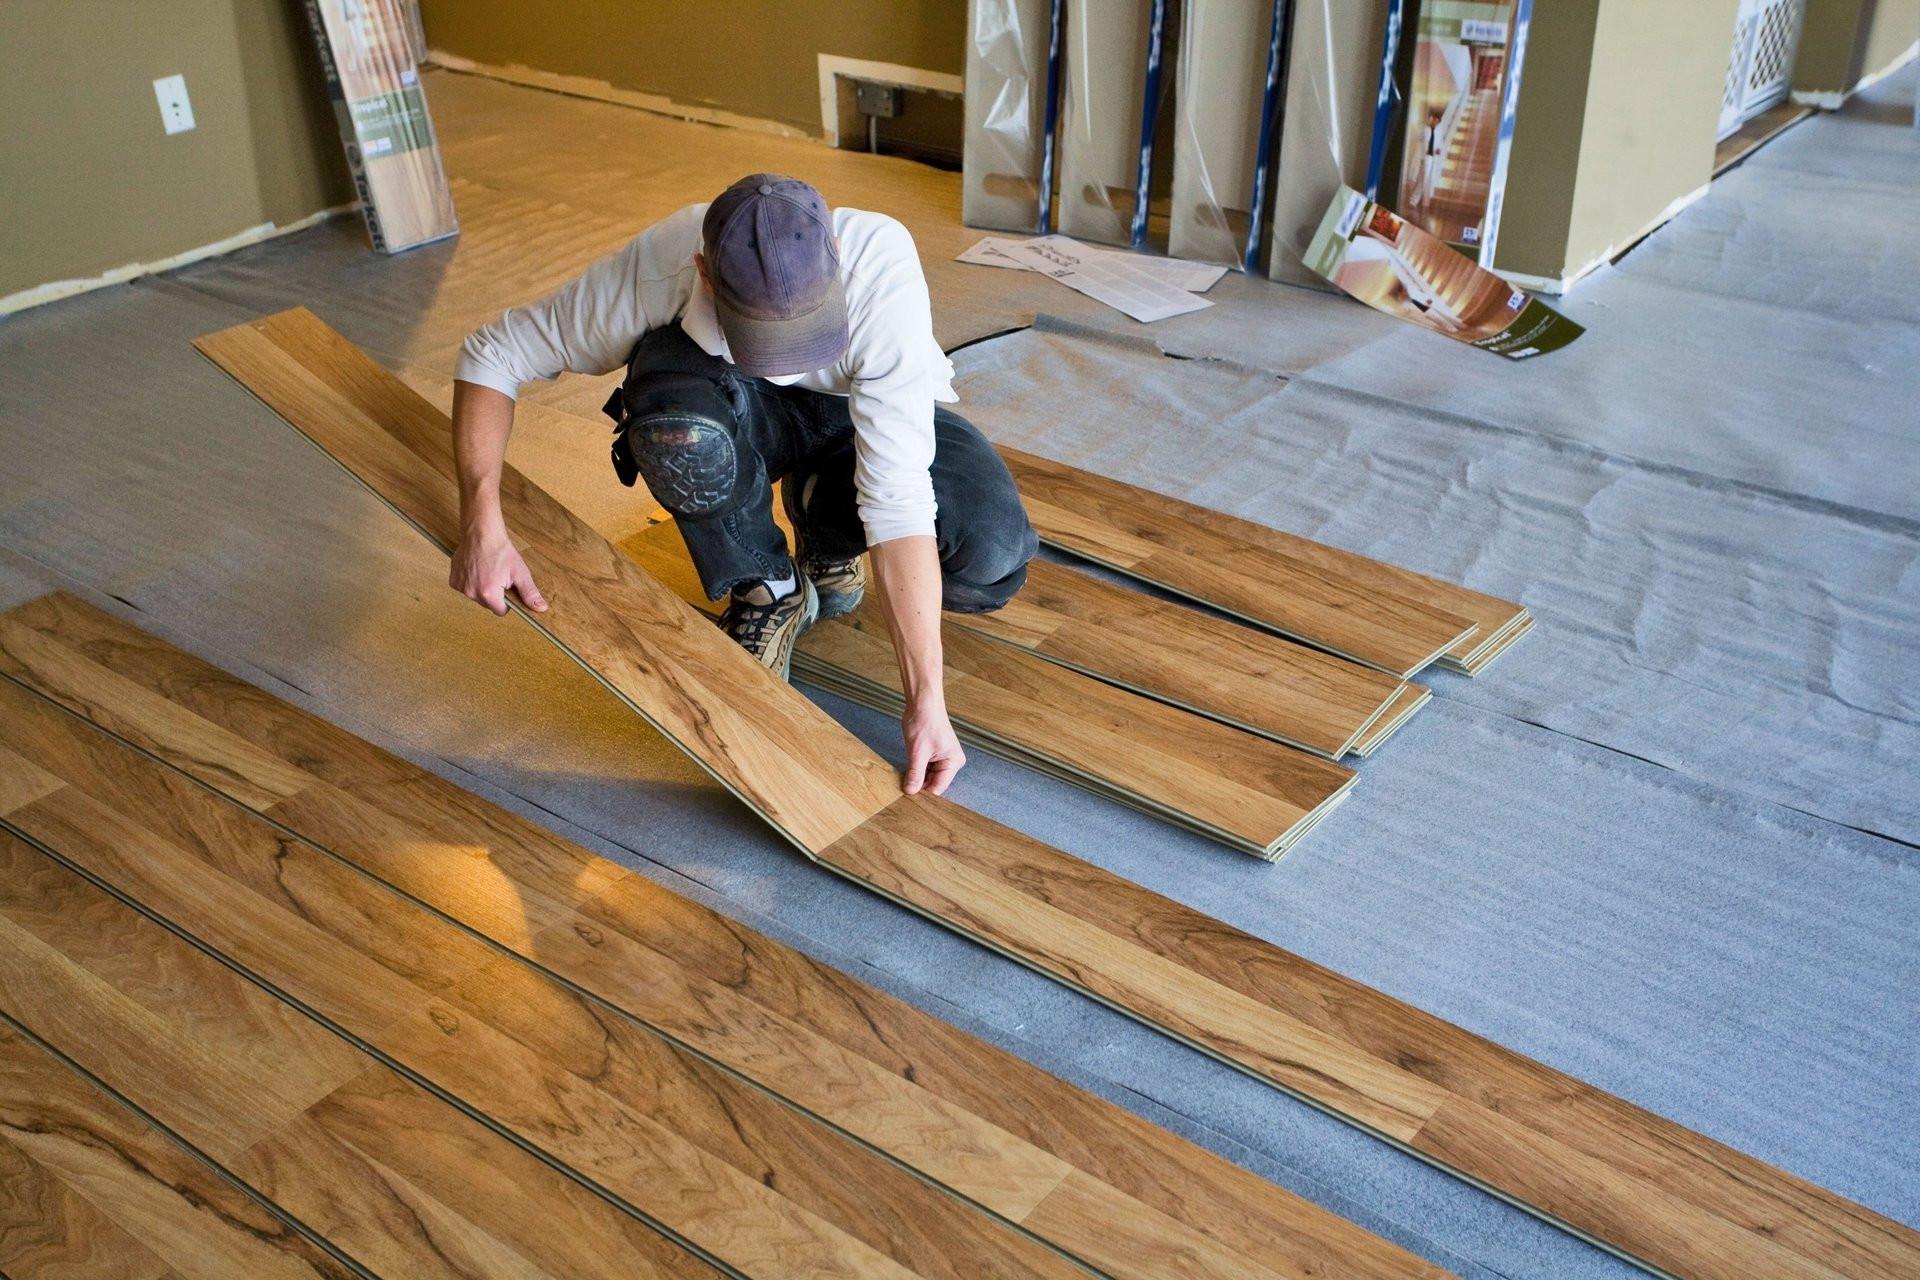 hardwood flooring services ct of american floor service hardwood flooring fairfield ct with regard to hardwood flooring